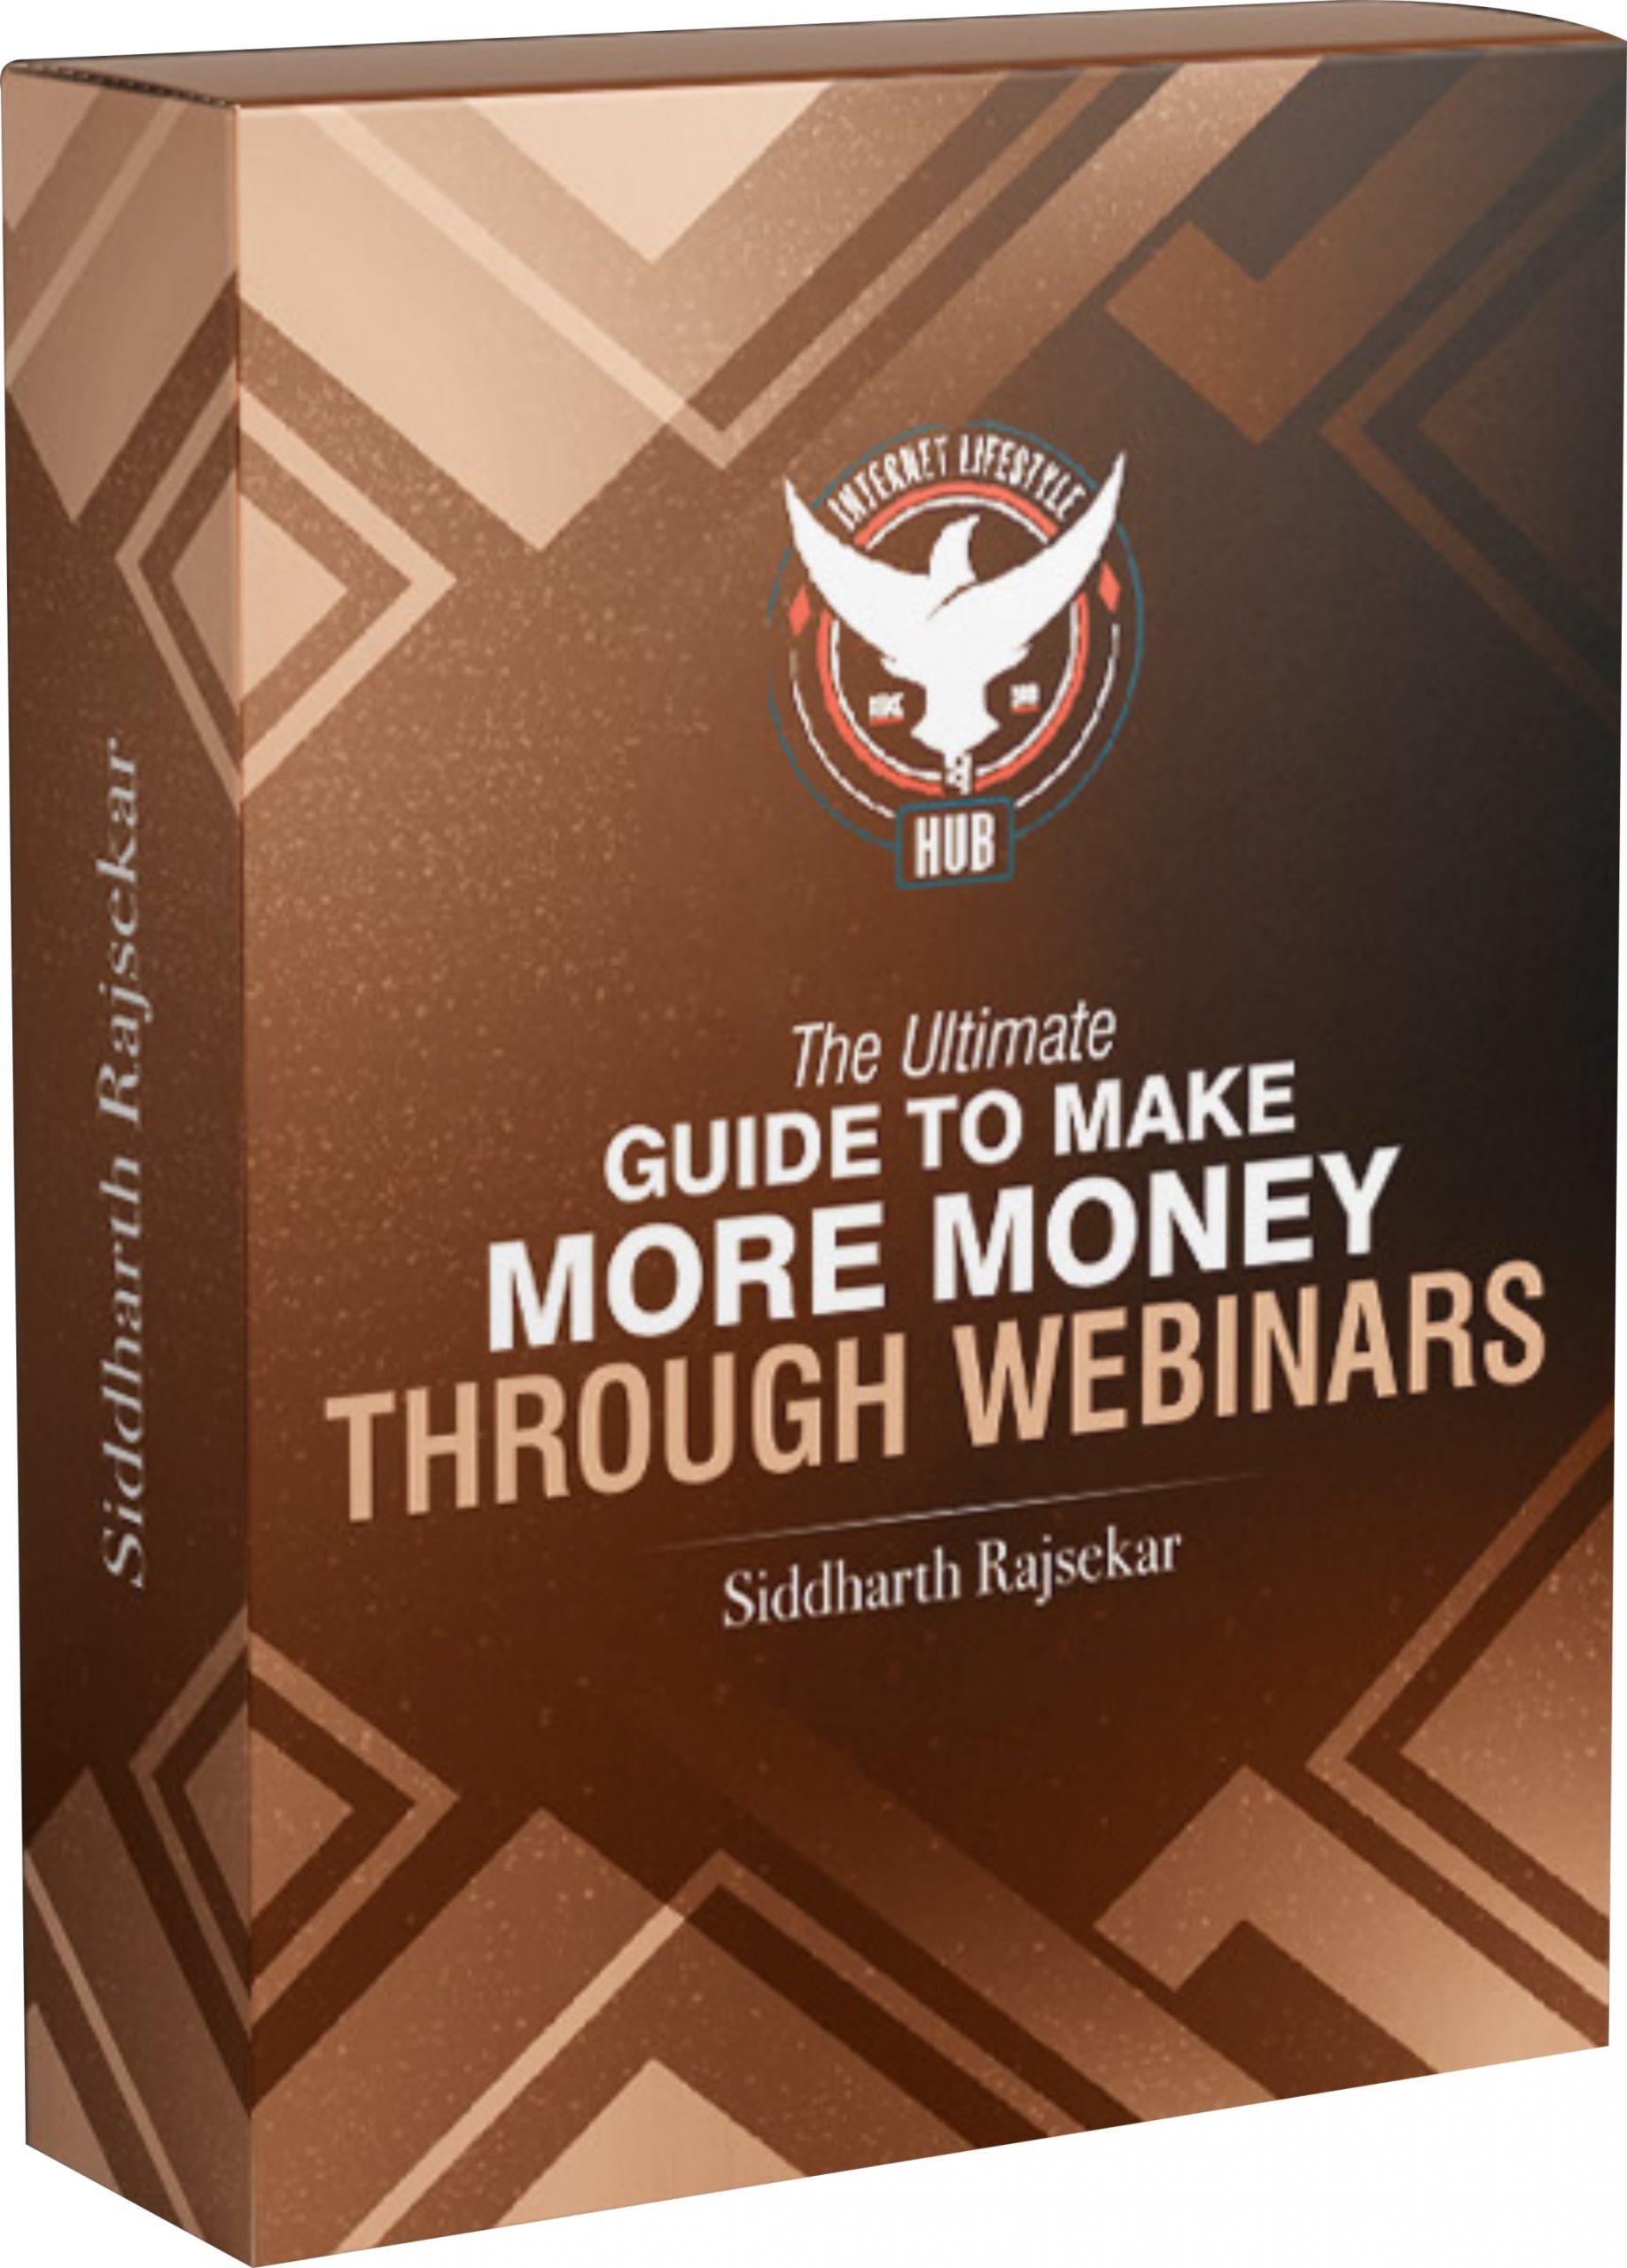 Money Through Webinars